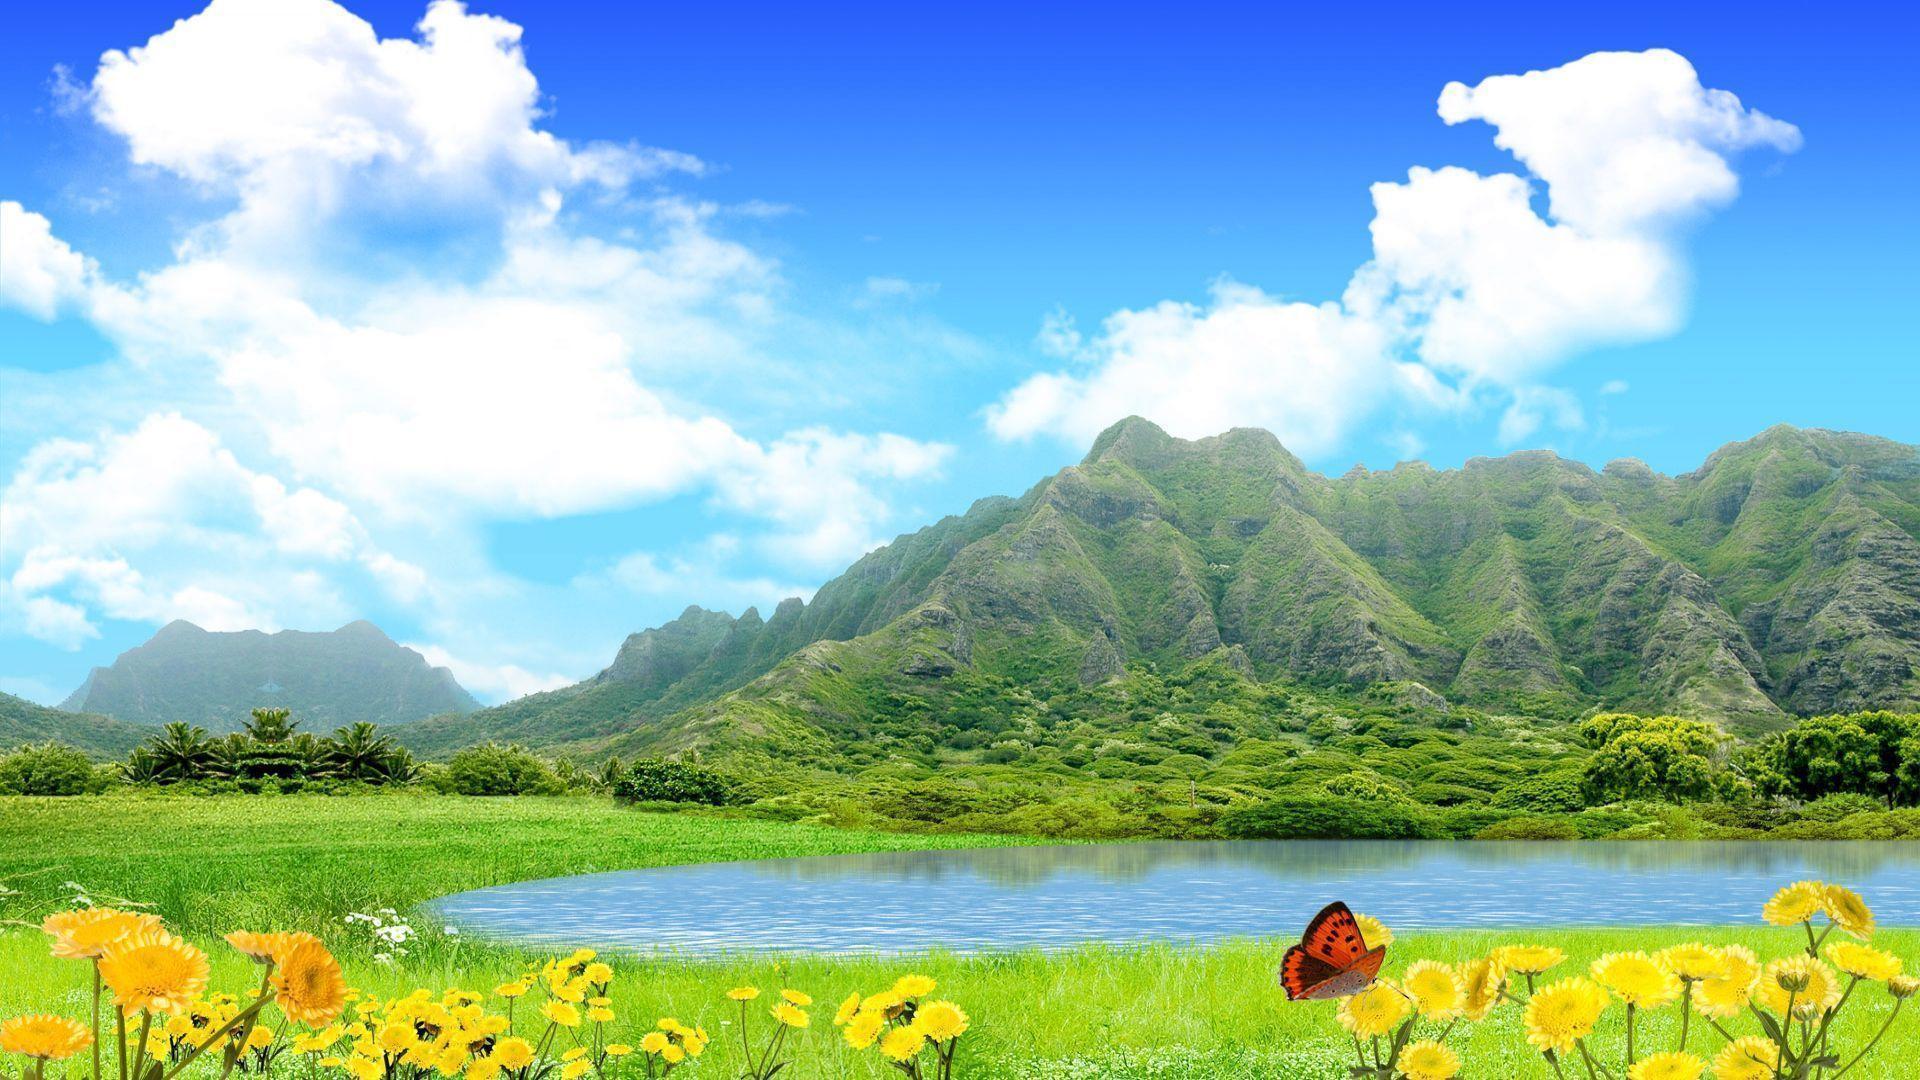 Country Summer Desktop Backgrounds